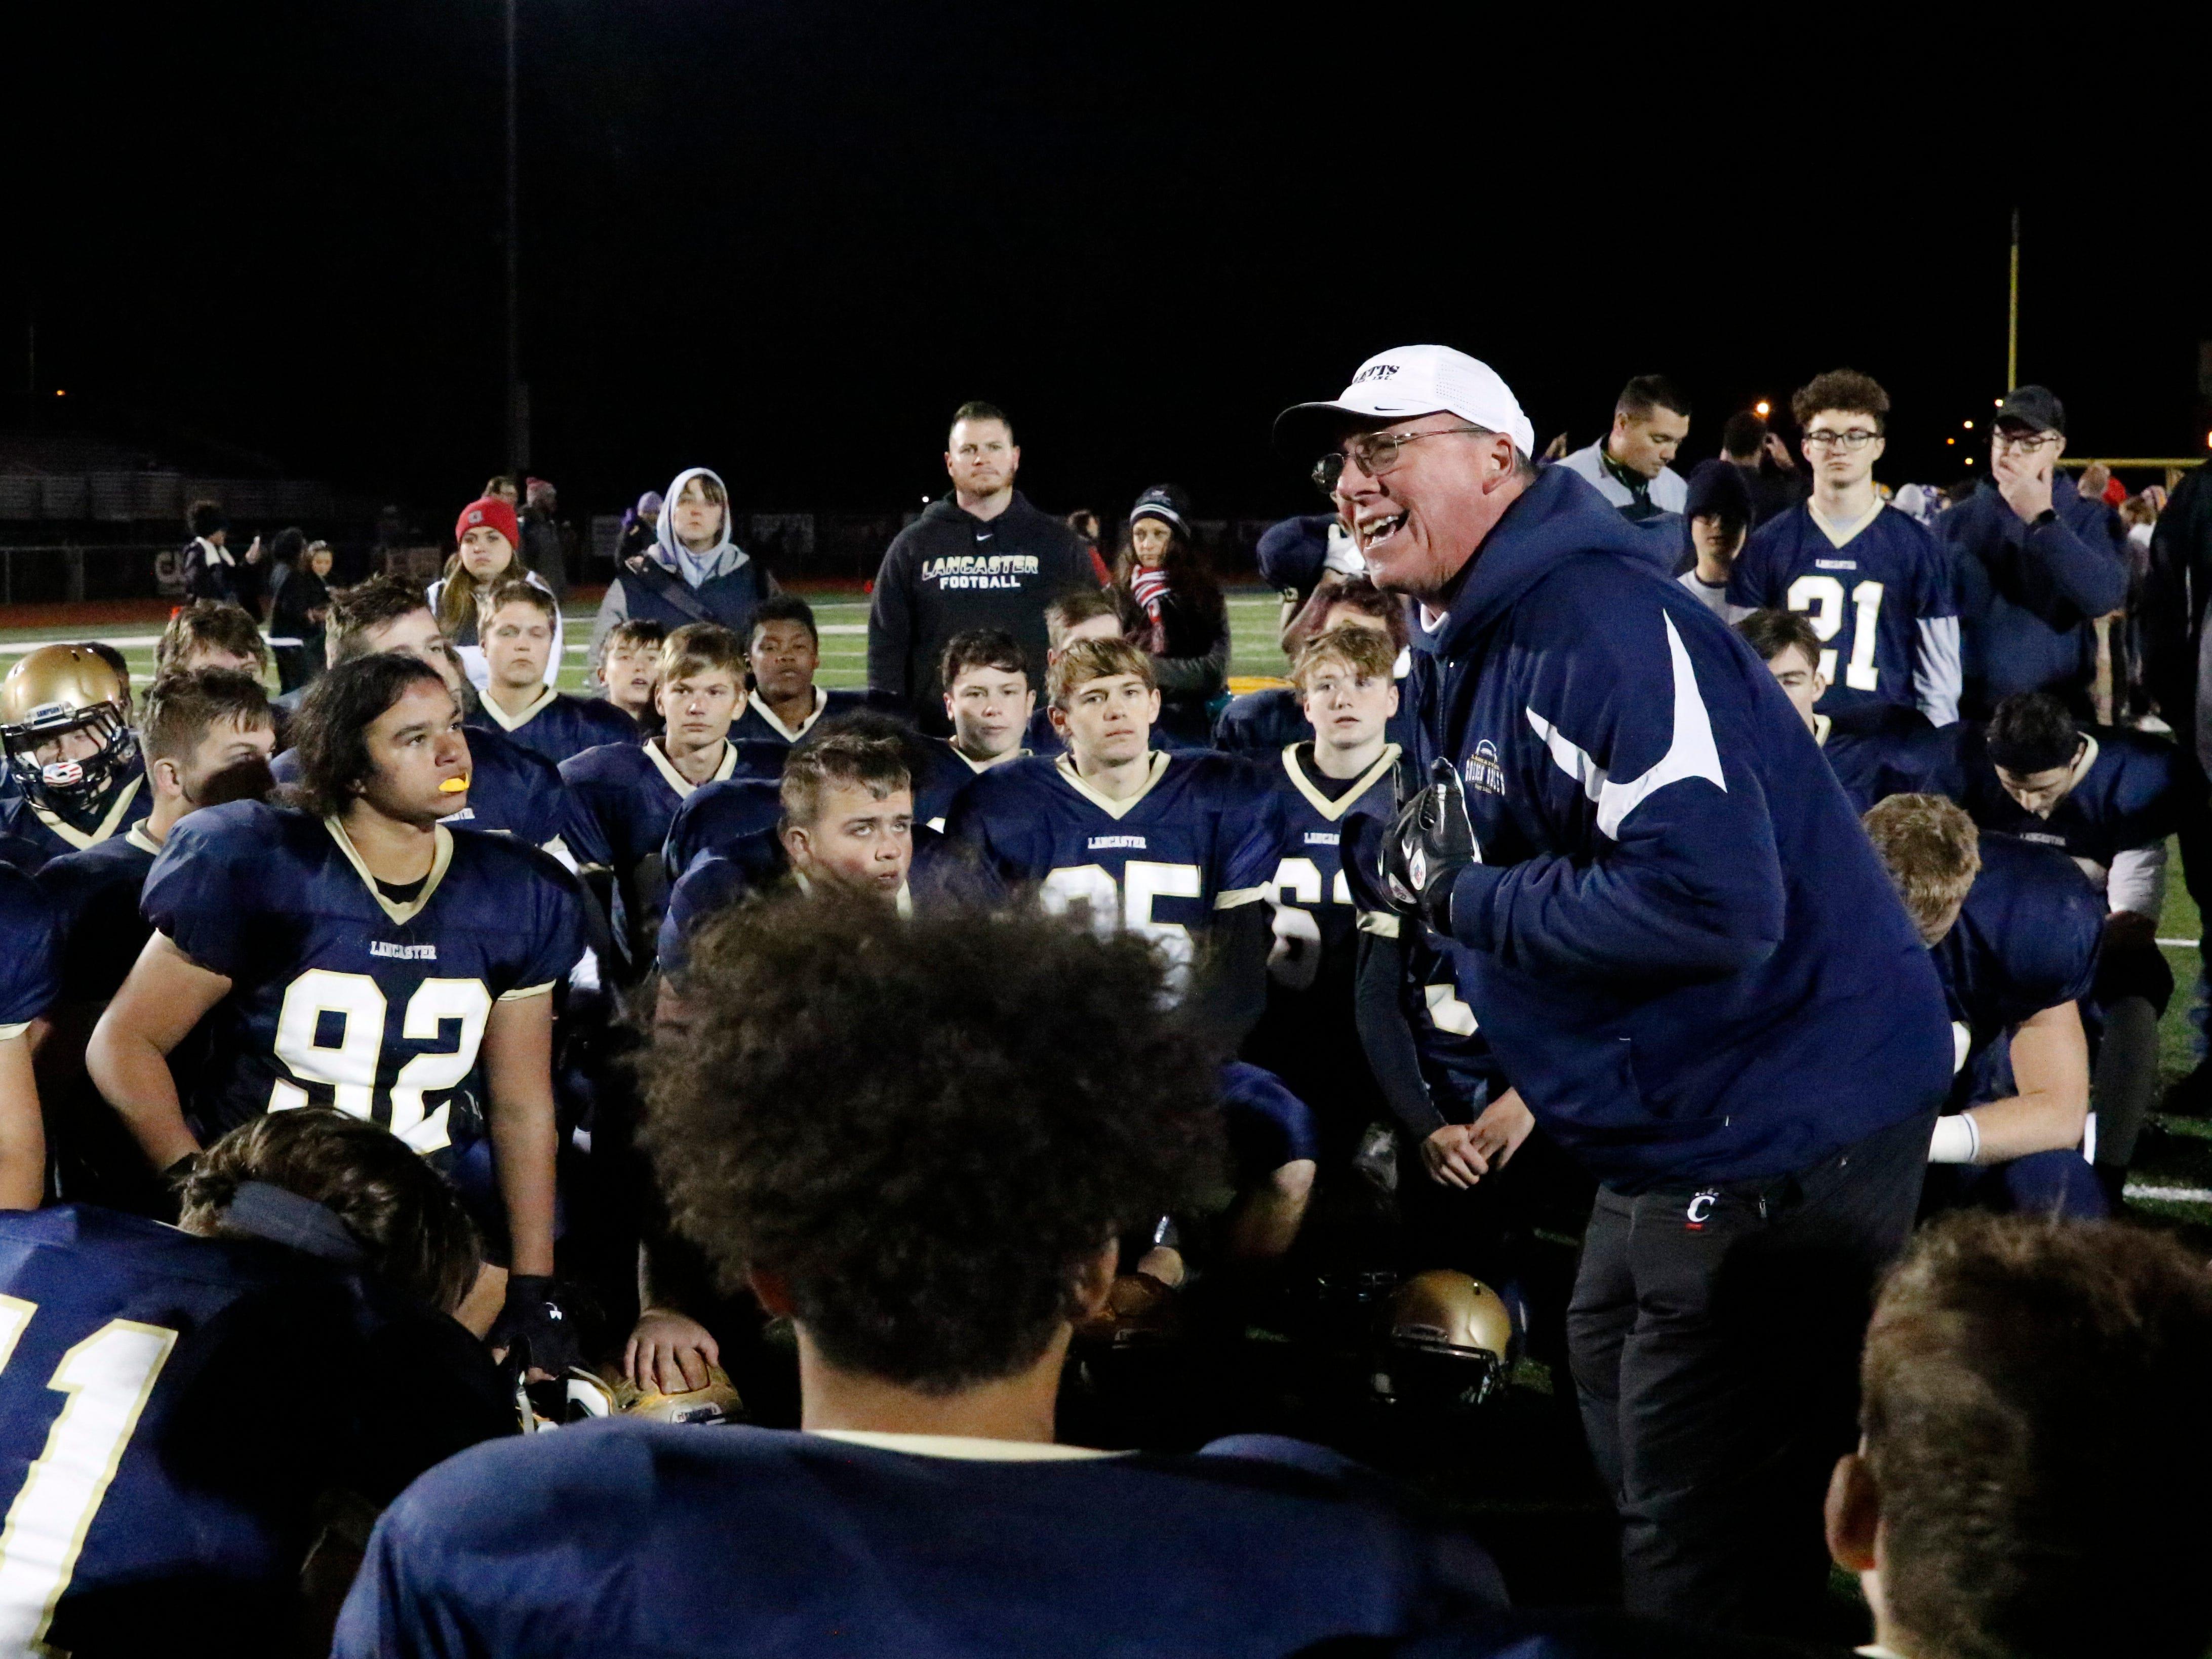 Lancaster football coach Rob Carpenter, right, talks to his team after a 28-7 loss to Reynoldsburg Thursday night, Oct. 25, 2018, at Fulton Field in Lancaster.